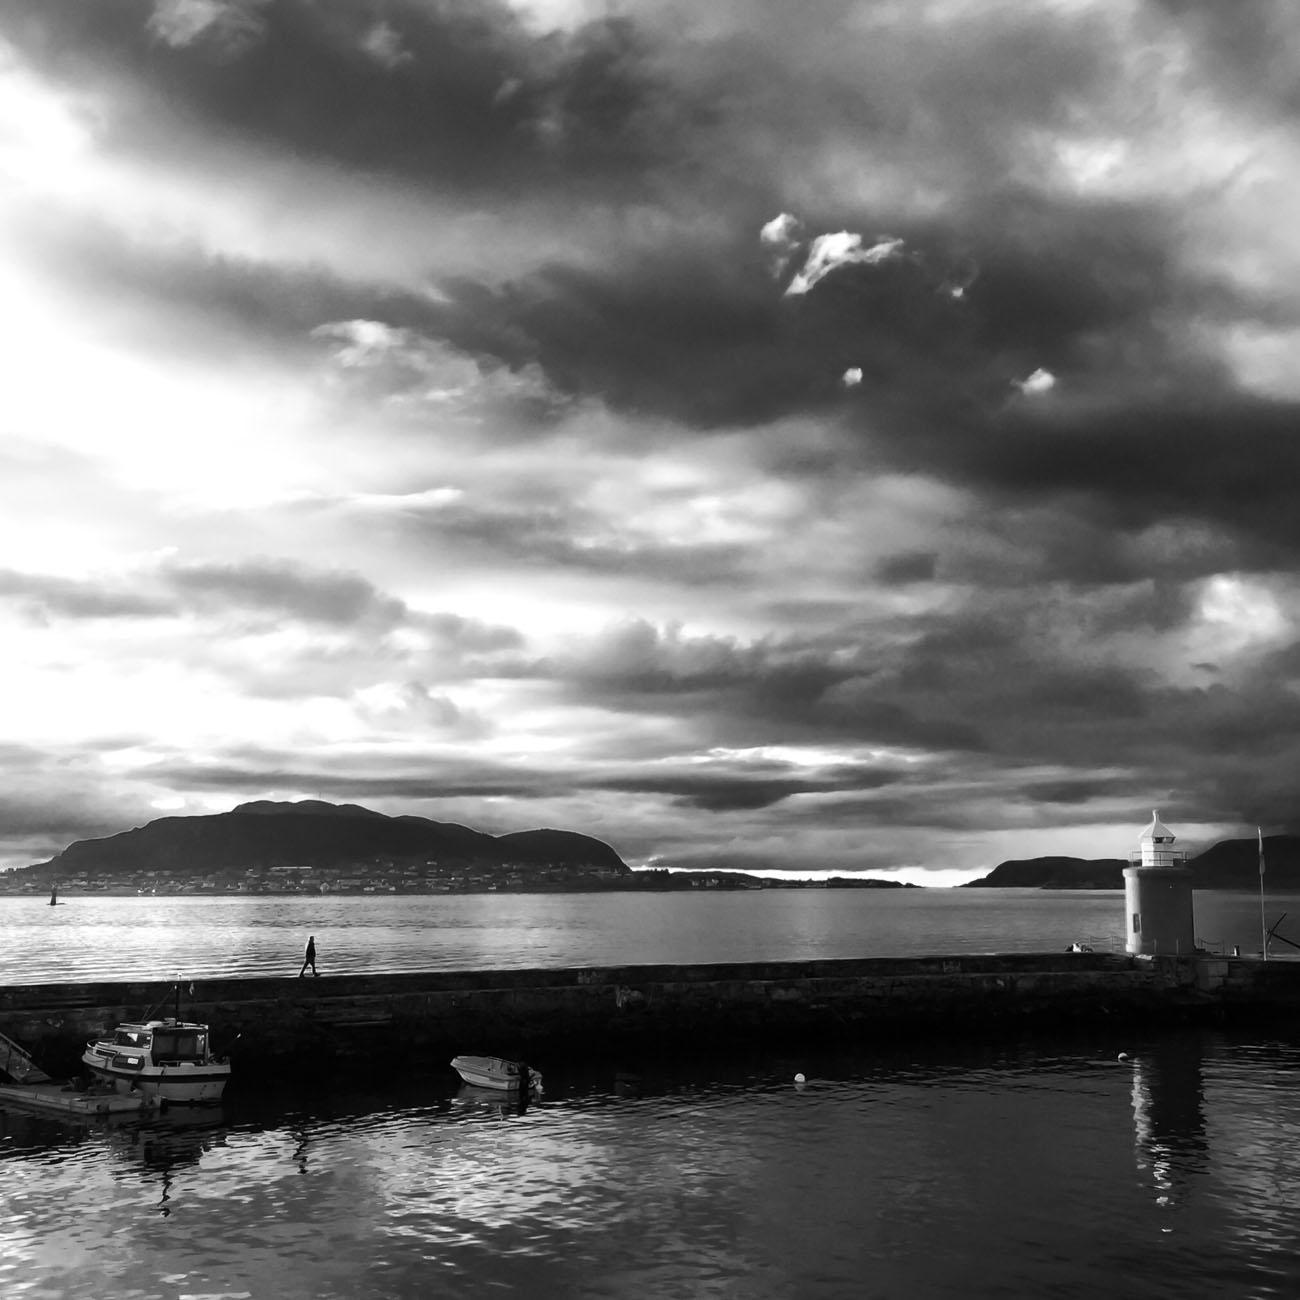 Ålesund - Noruega - JESUS RODRIGUEZ, FOTOGRAFIA DE NATURALEZA